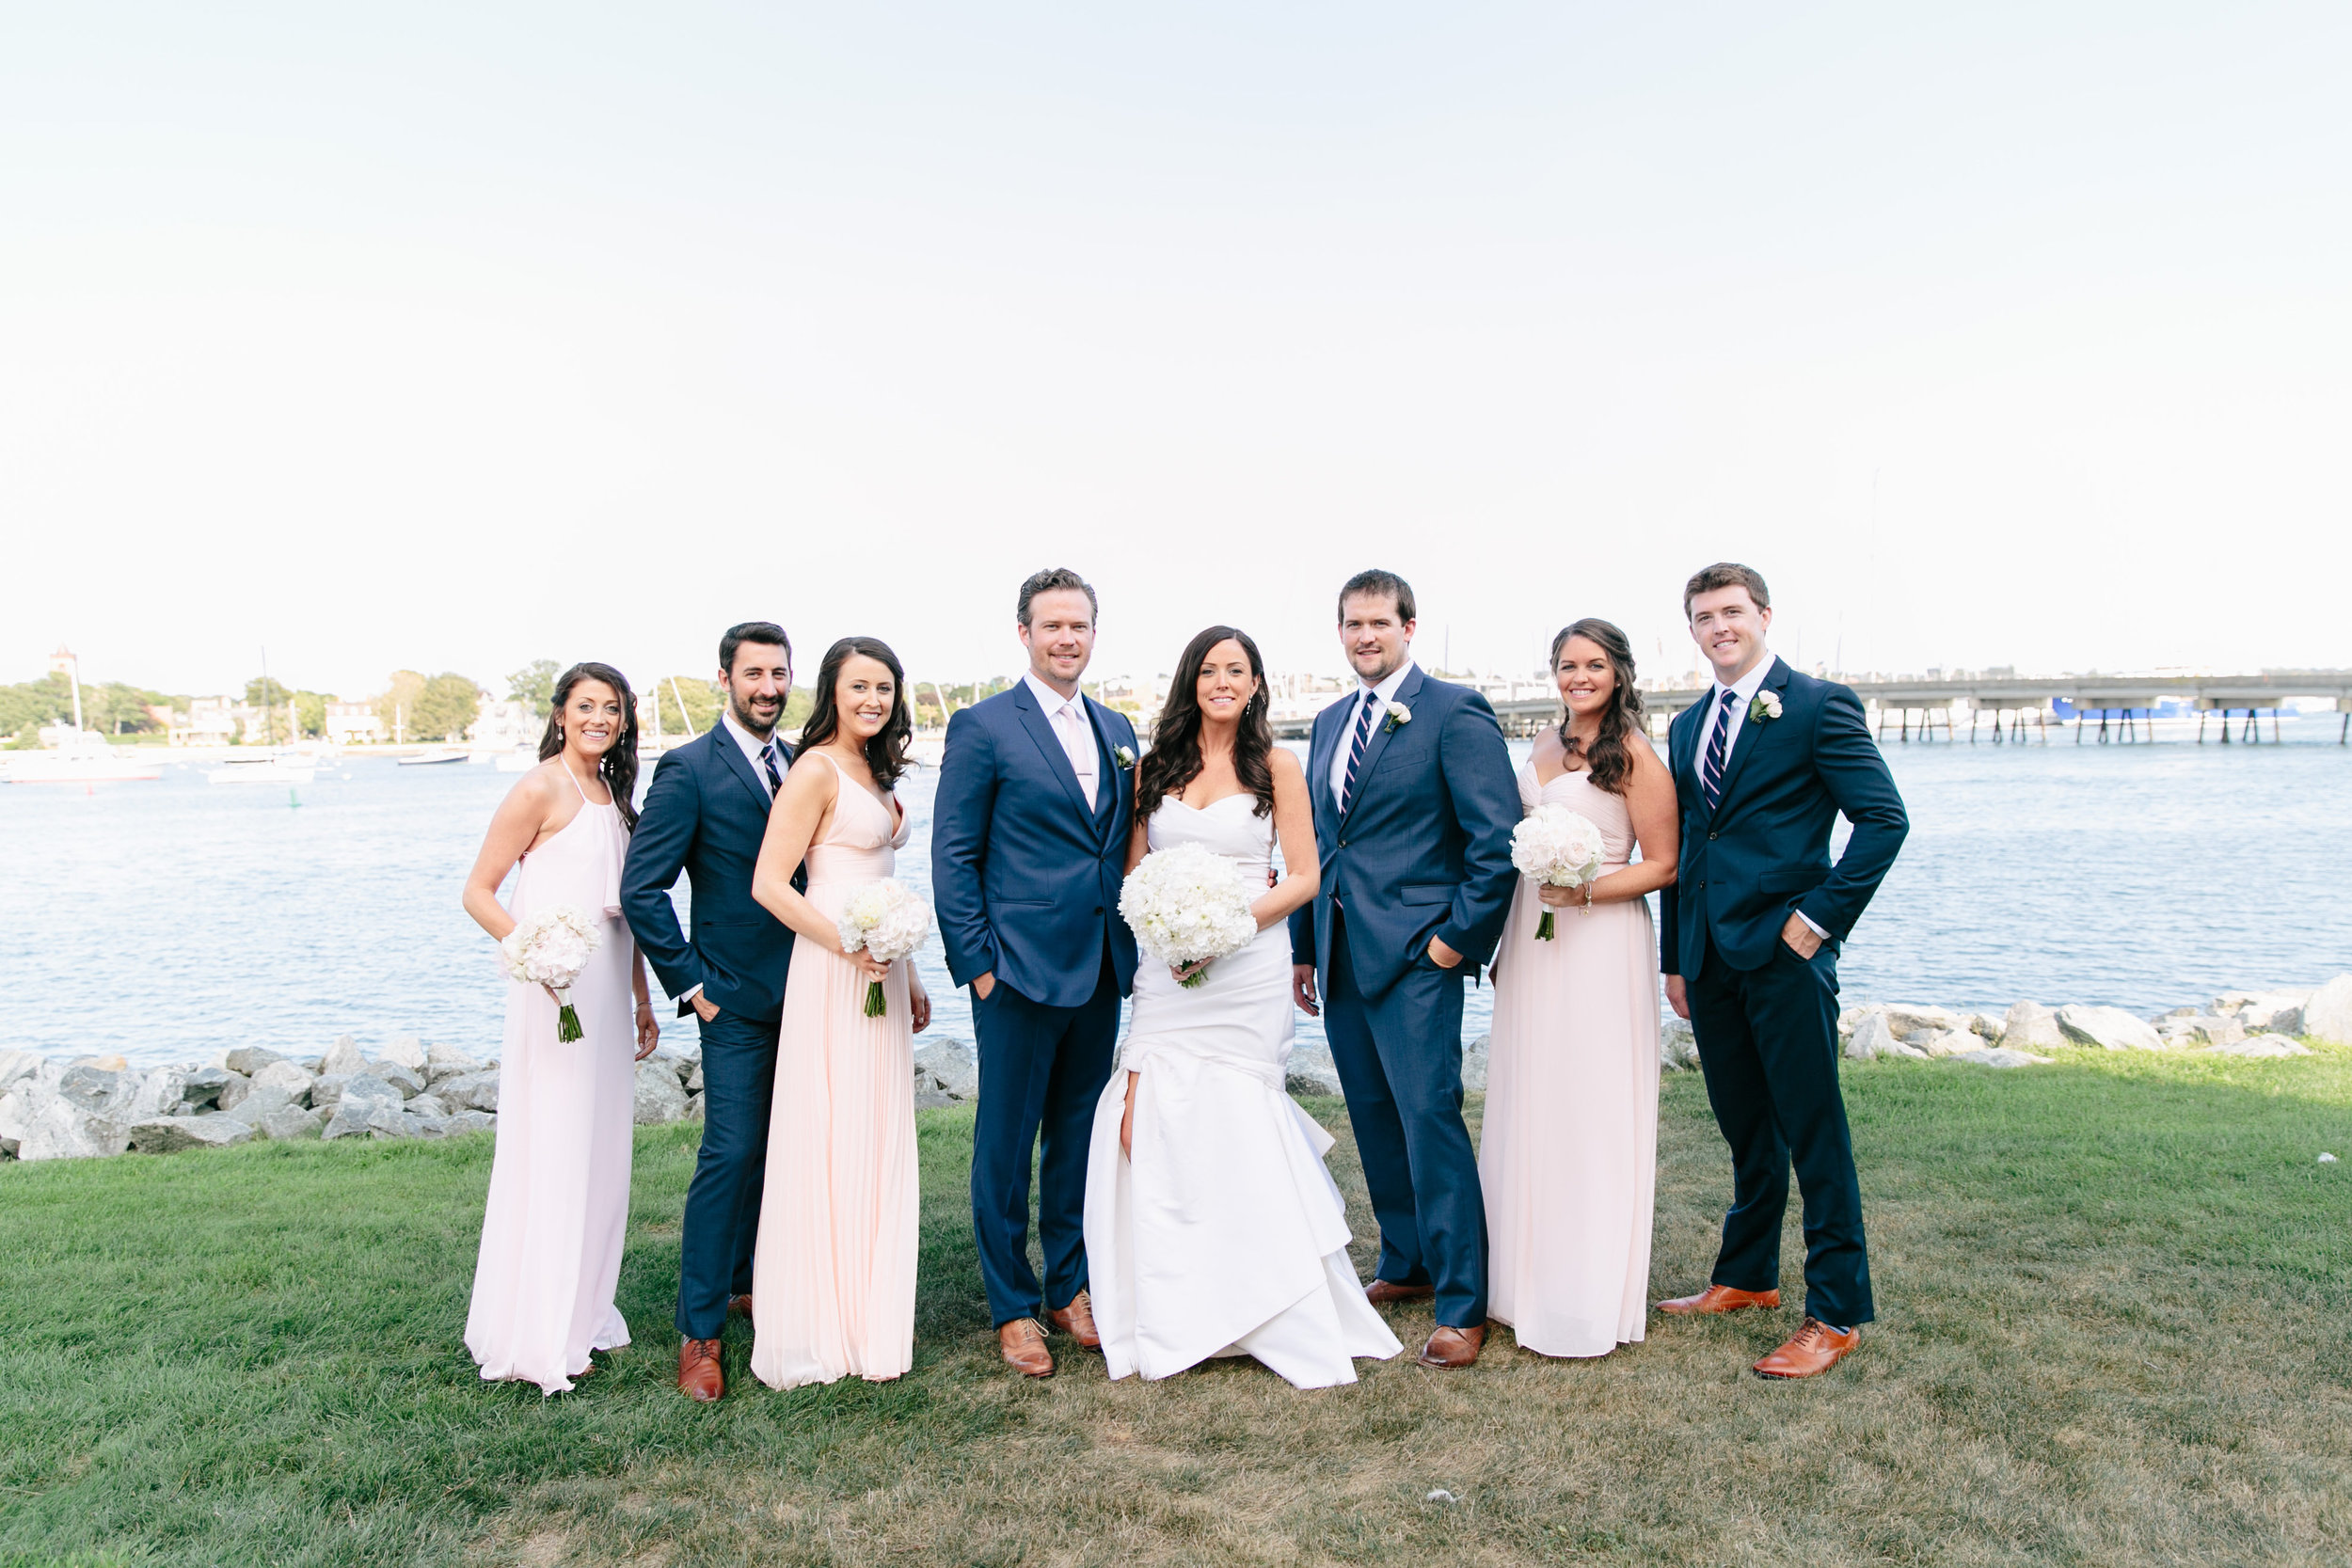 hyatt-regency-wedding-newport-rhode-island0743